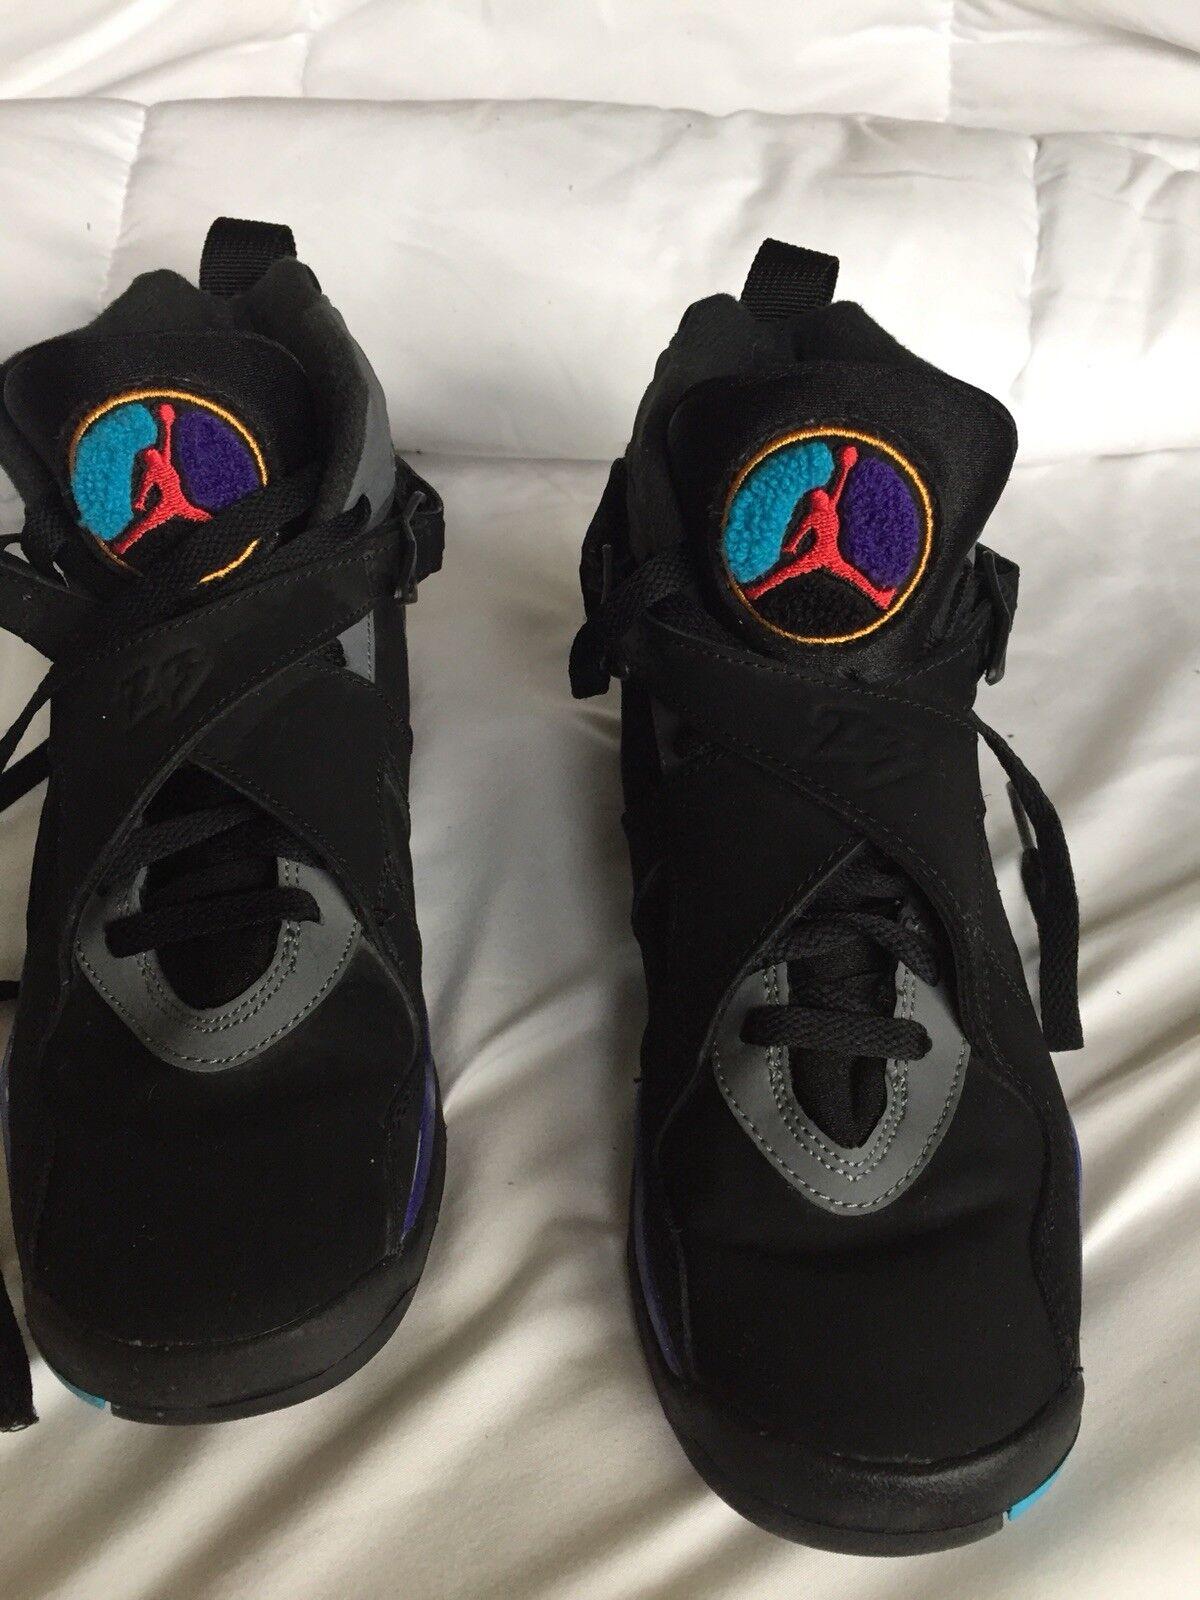 Air Jordan Retro 8 shoes YOUTH Size 4.5